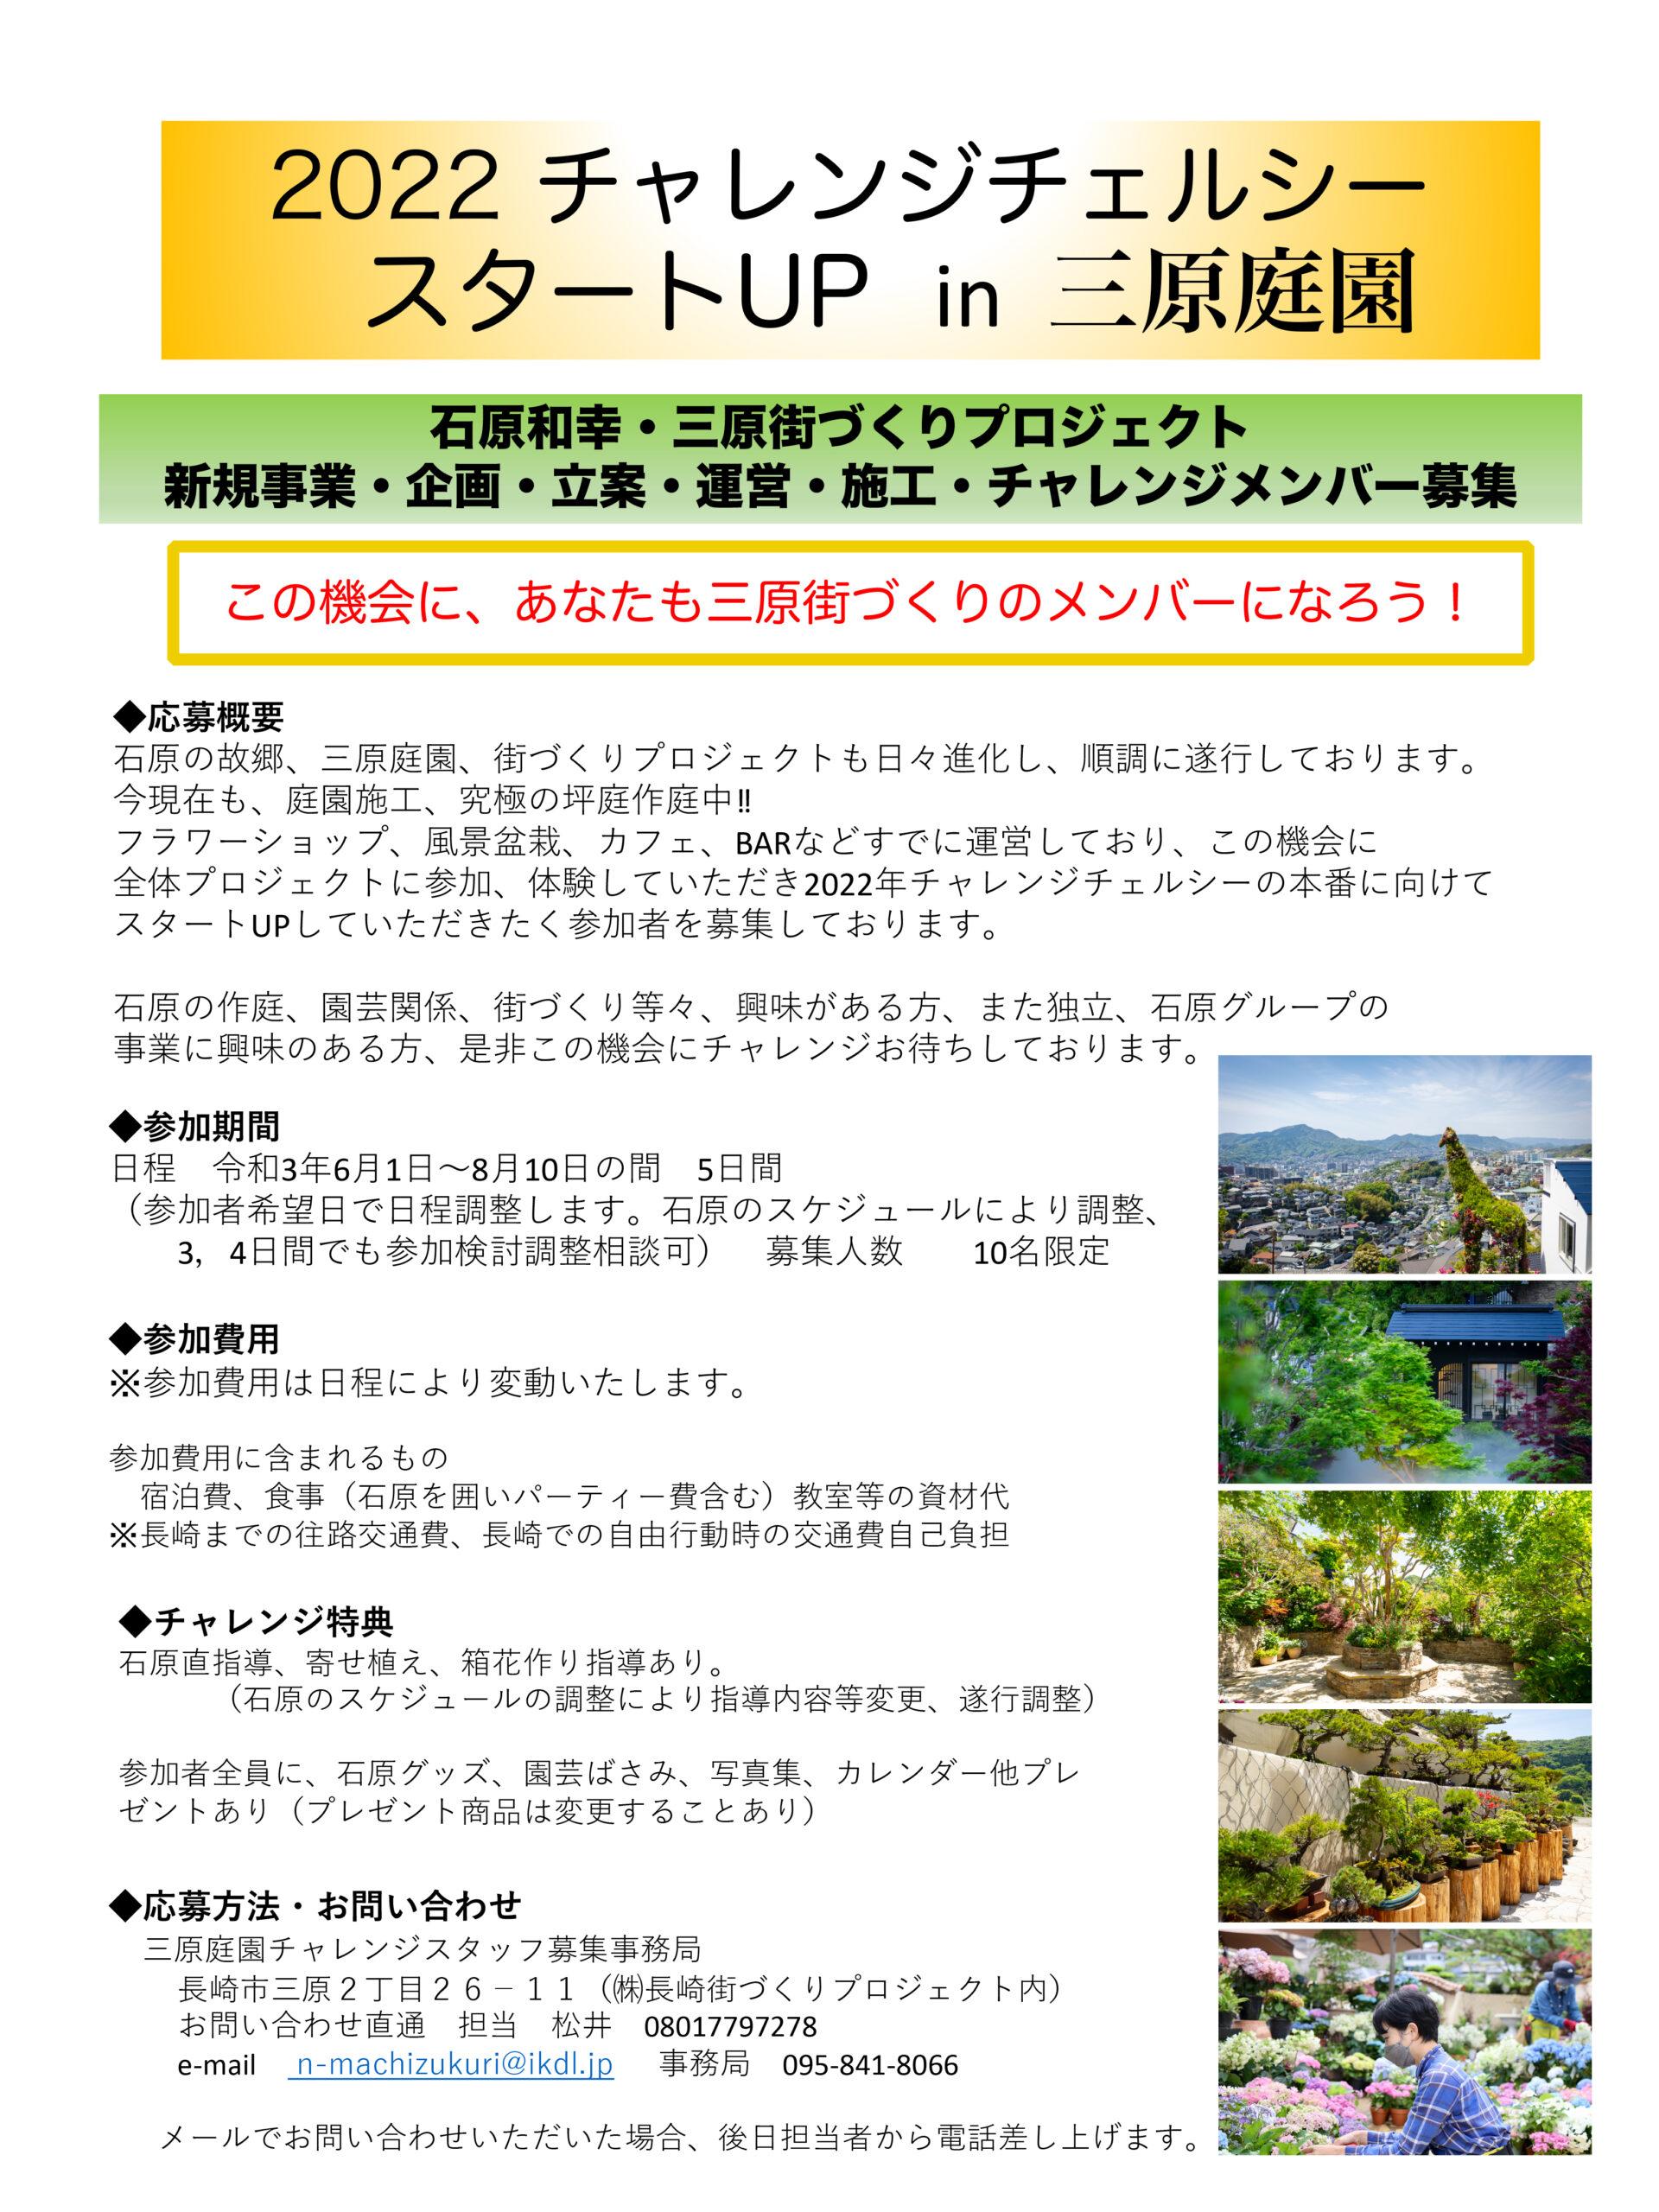 【募集】start up in 三原庭園